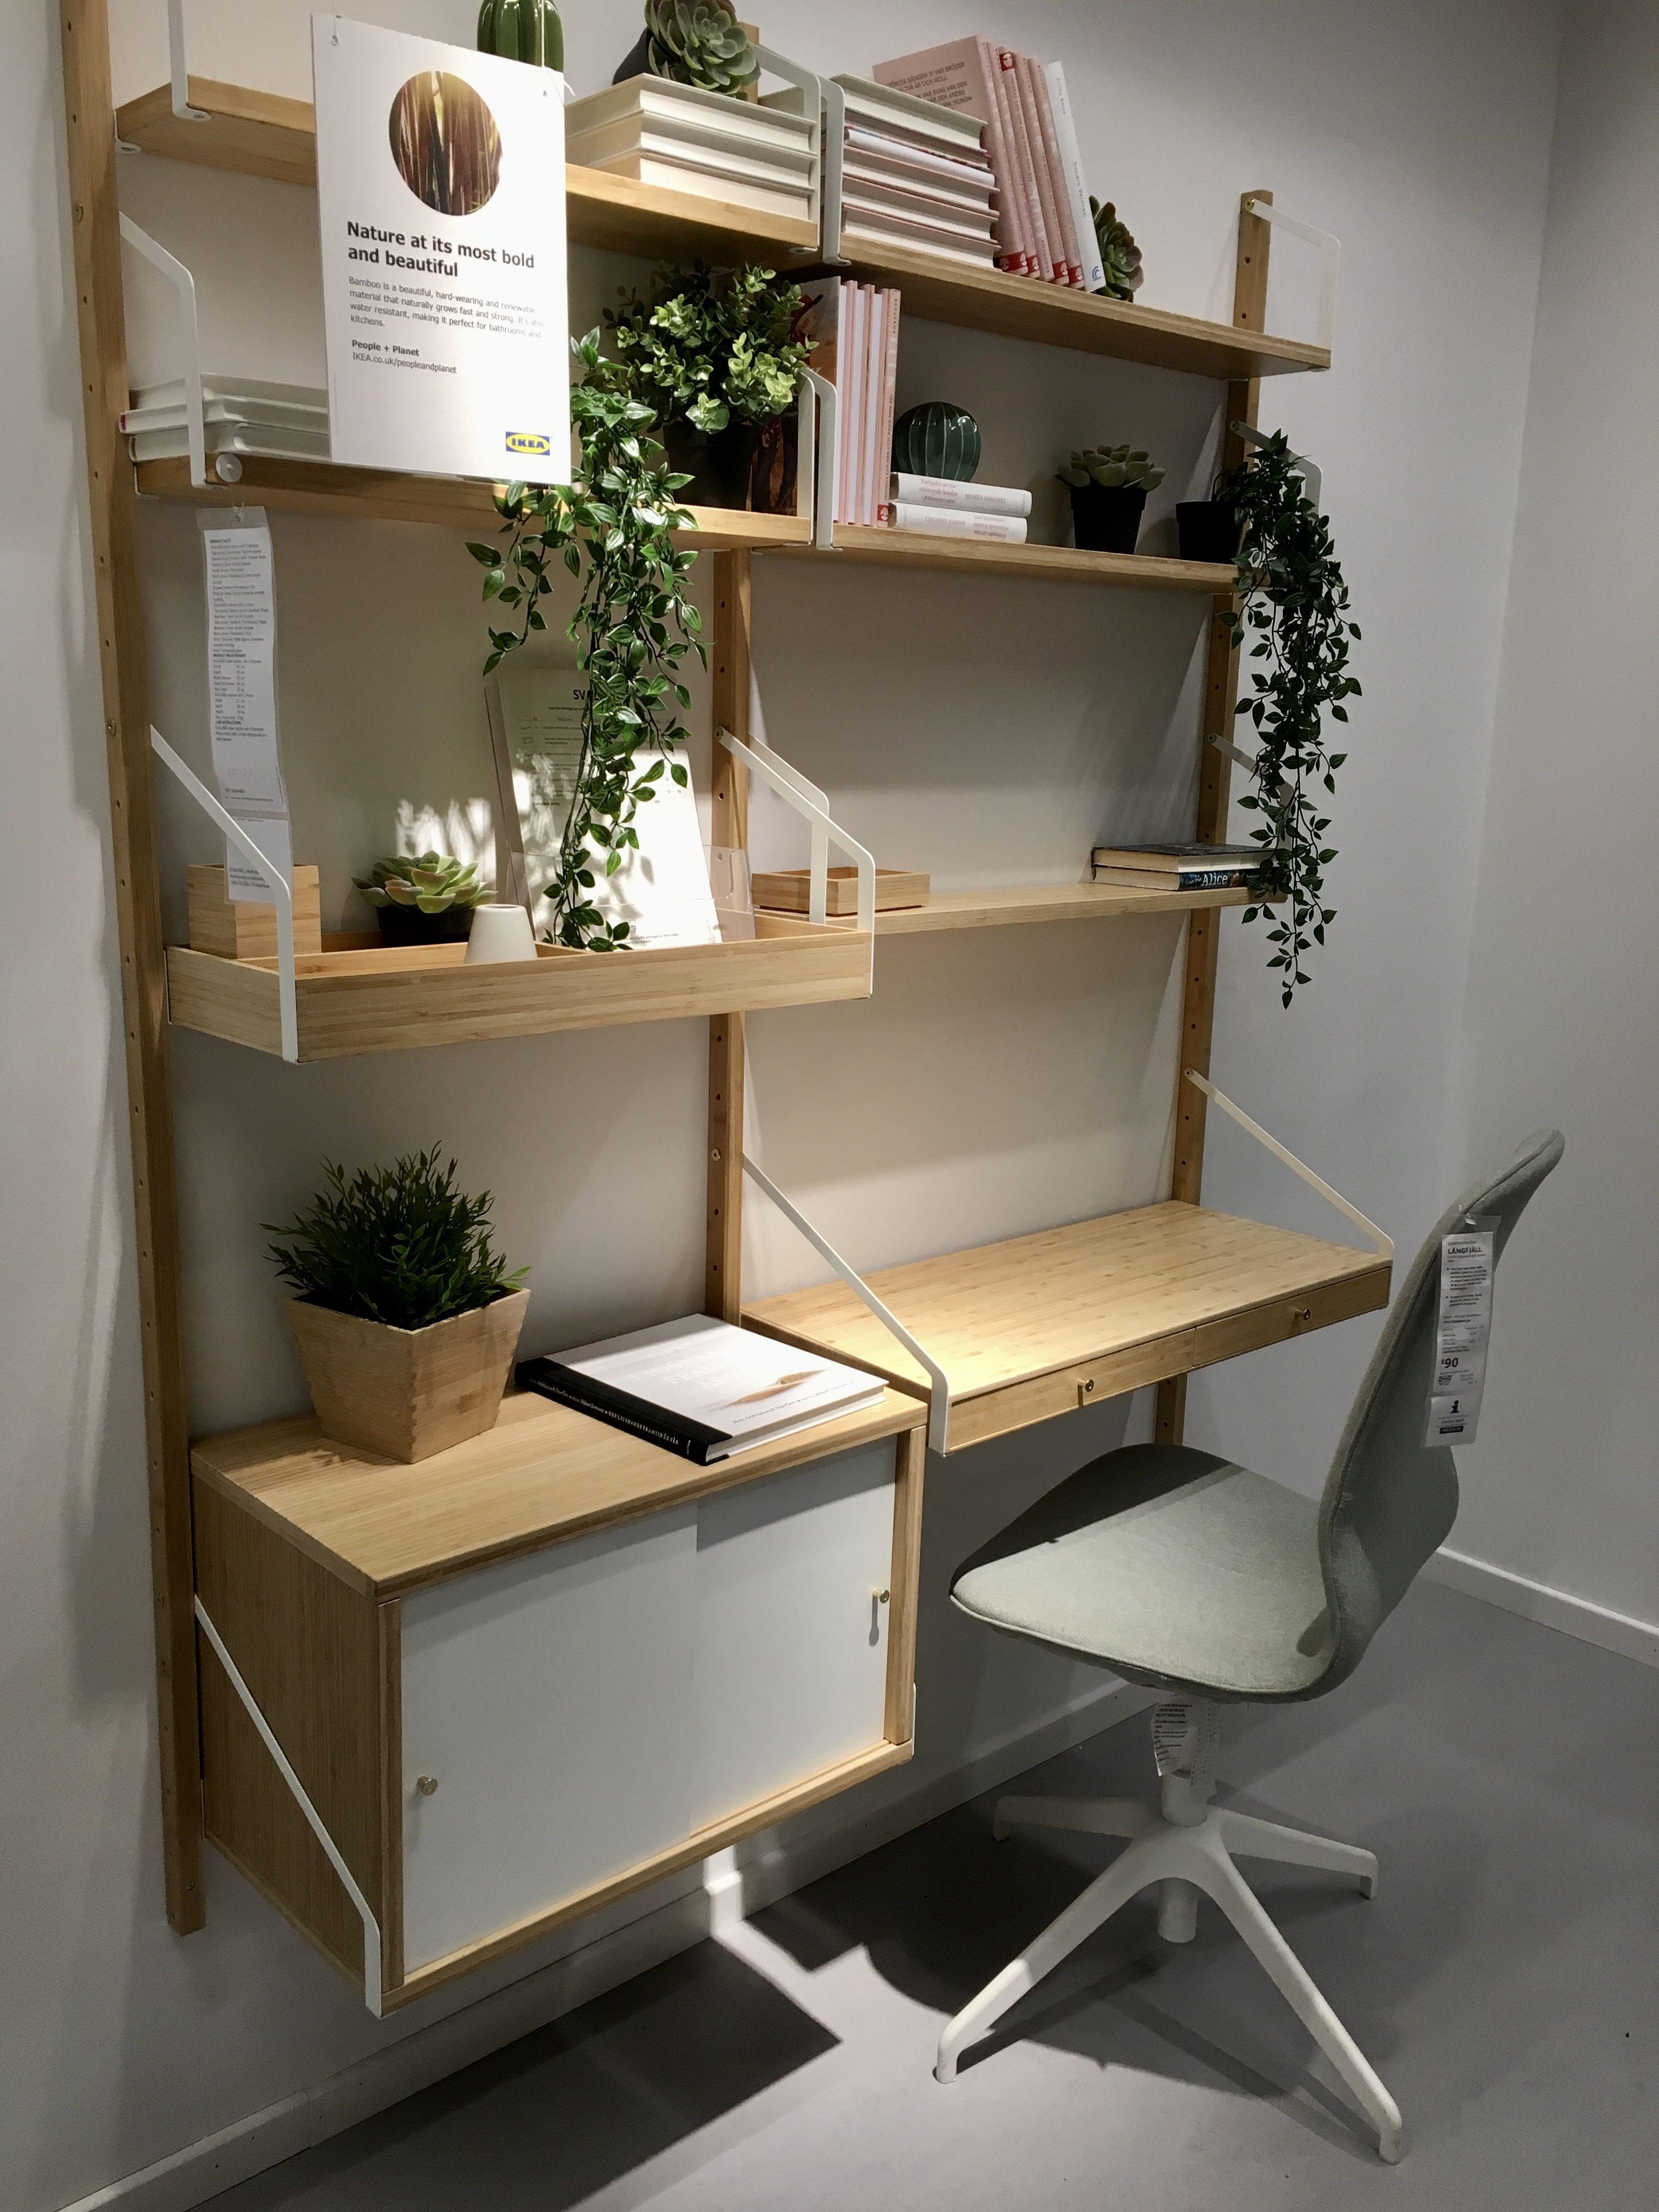 Ikea Svalnas Combination Price 260 Svalnas Wall Upright 10 X 3 Svalnas Desk Space 55 X 1 Home Office Furniture Design Home Room Design Guest Room Office